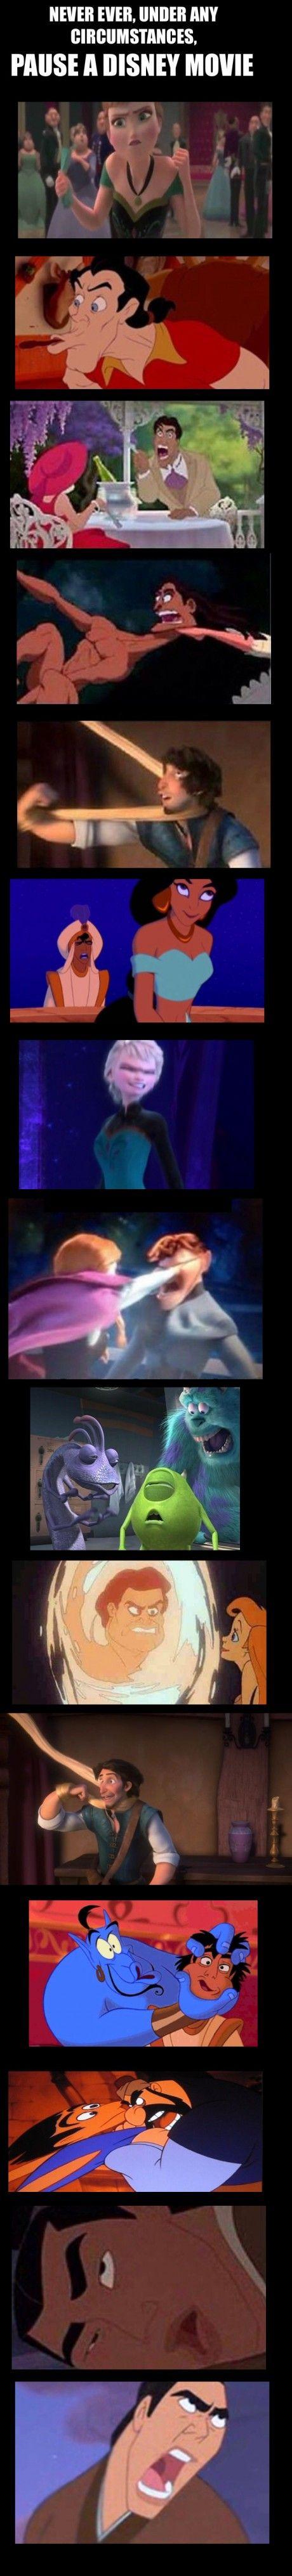 Always, under every circumstance, pause a Disney movie.